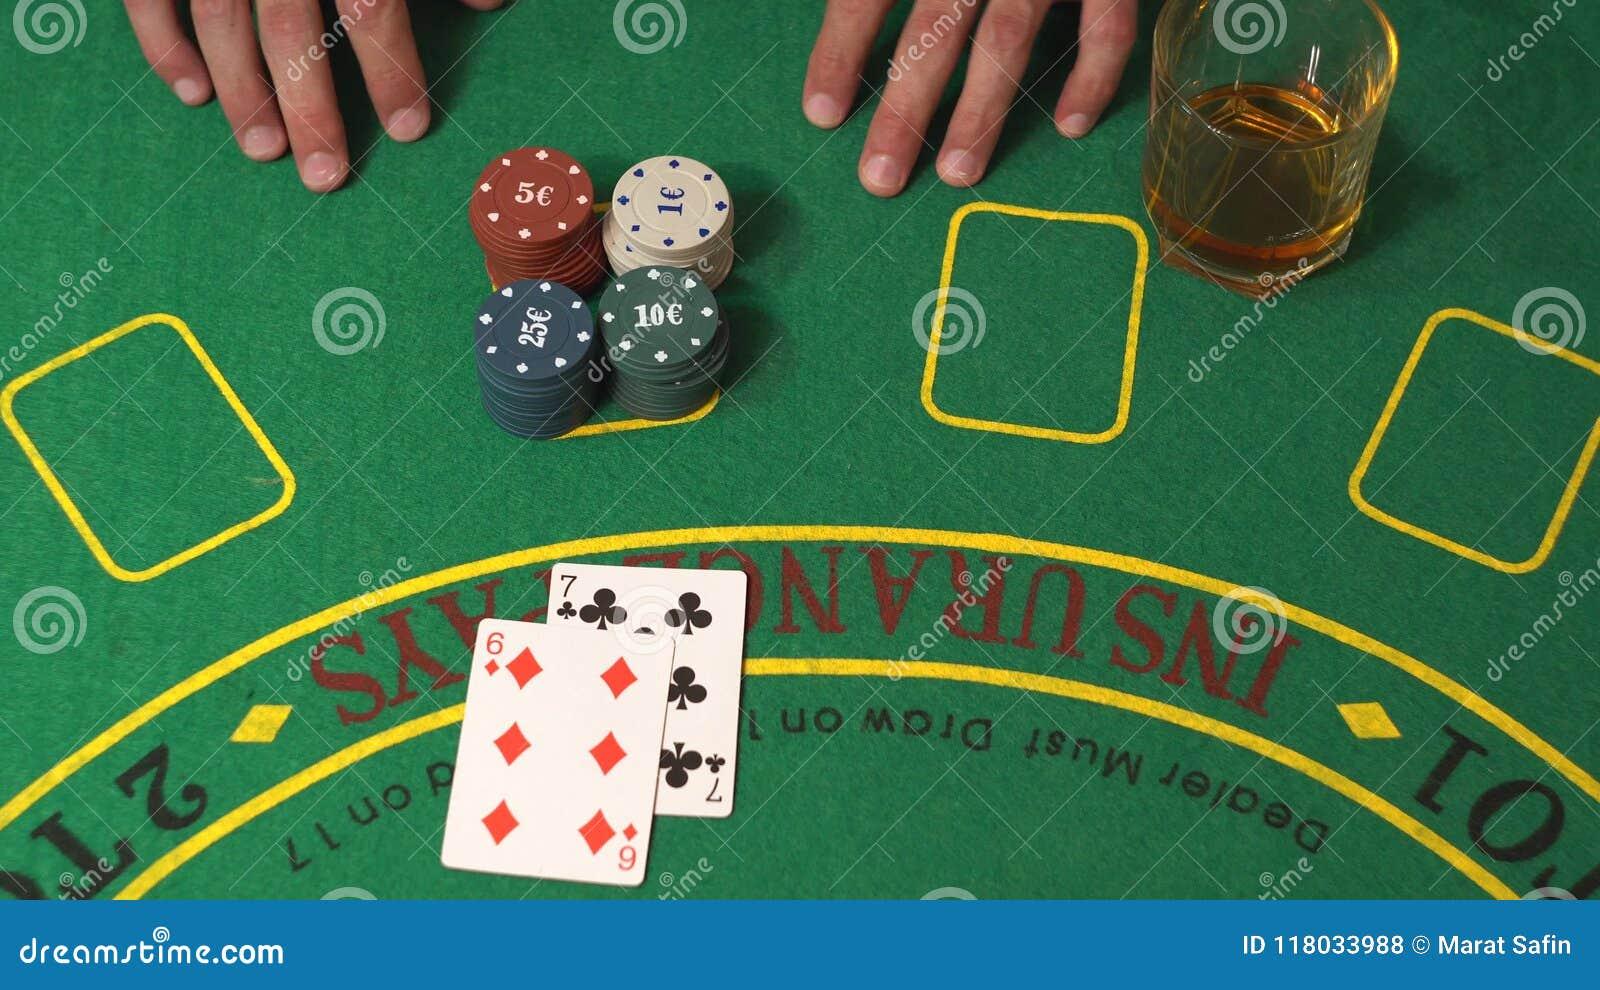 Blackjack Gambling Player Risk Get Lucky 21 Win In Casino